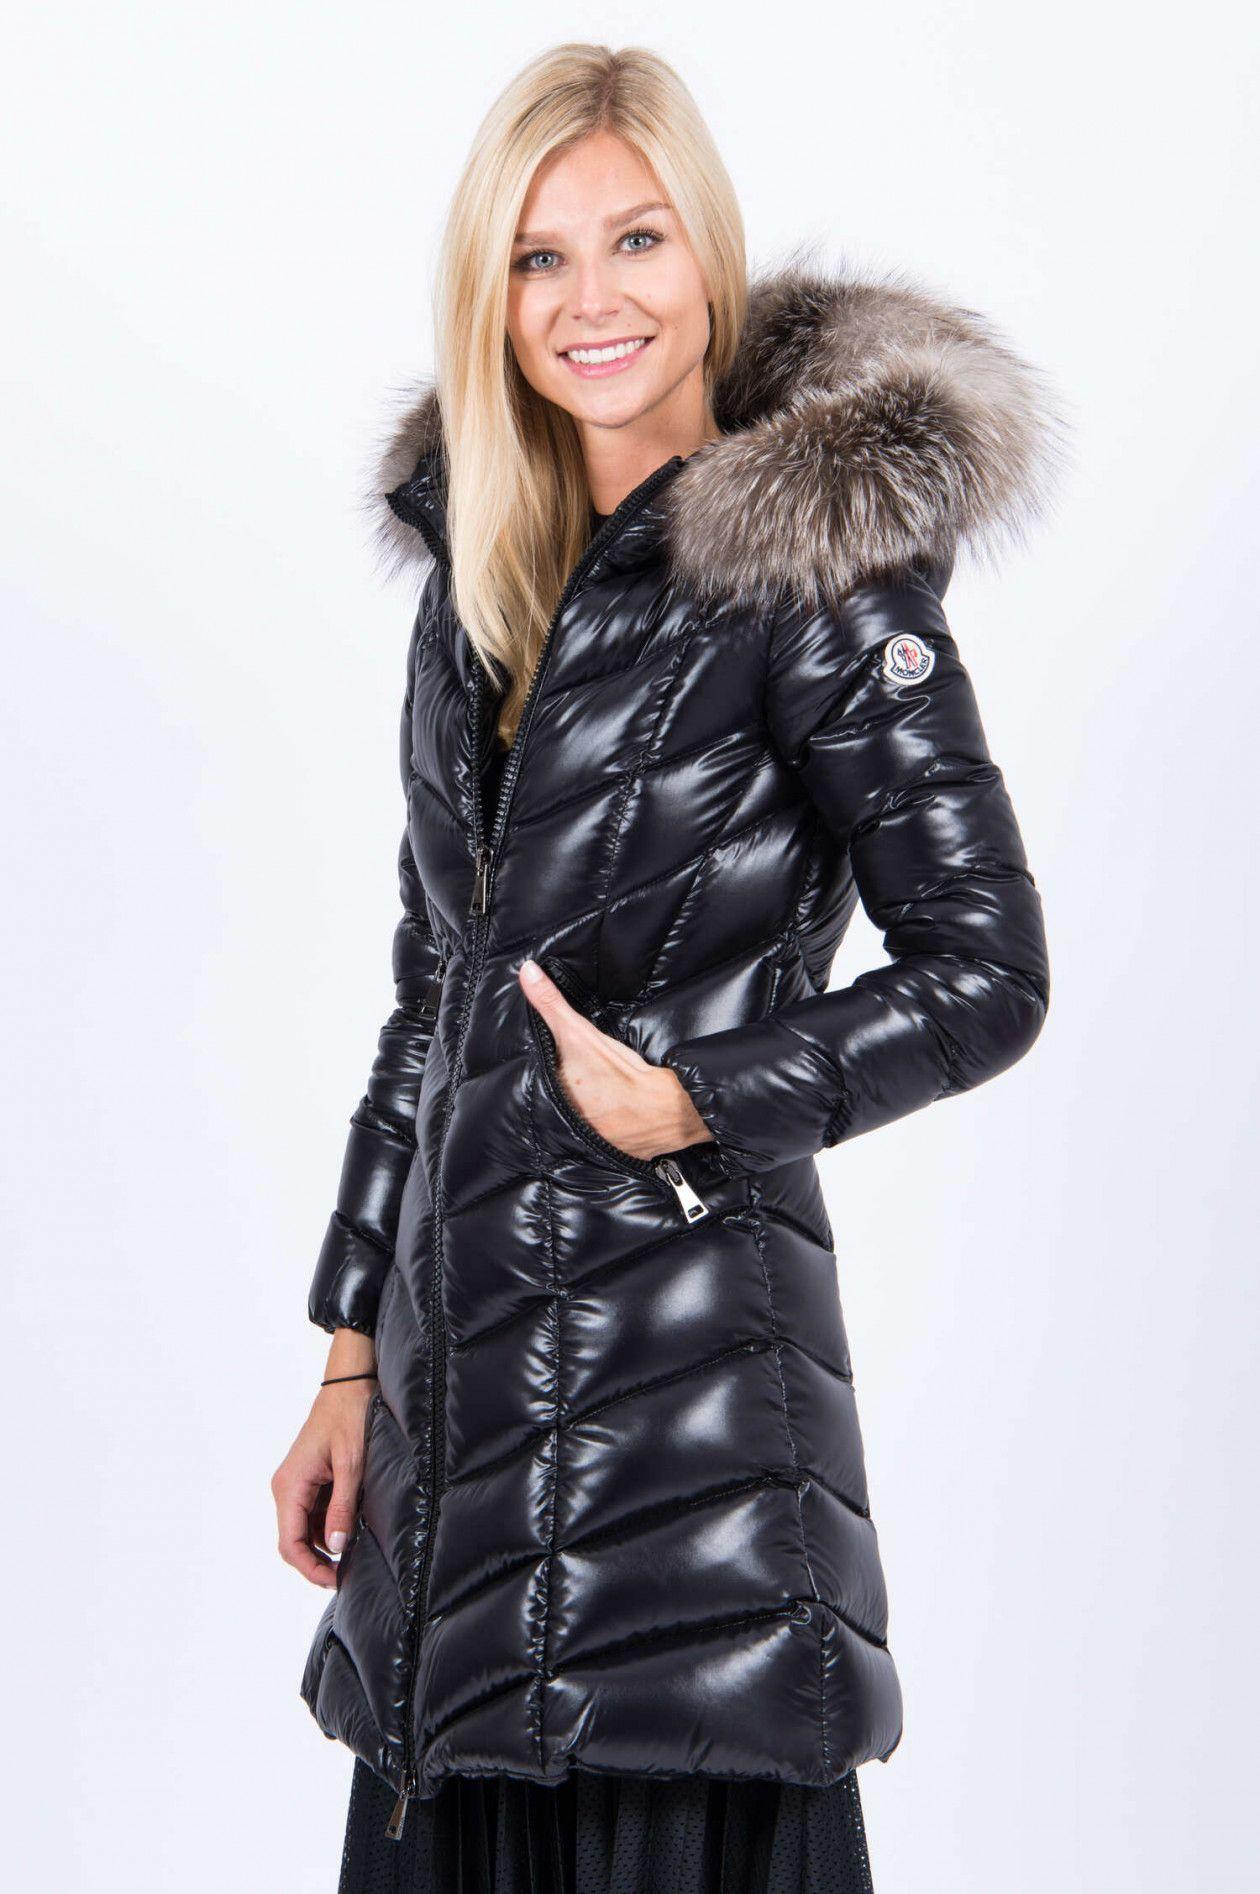 Winterjacke Kurzmantel Damen Steppmantel kurz schwarz Wintermantel Wet Look